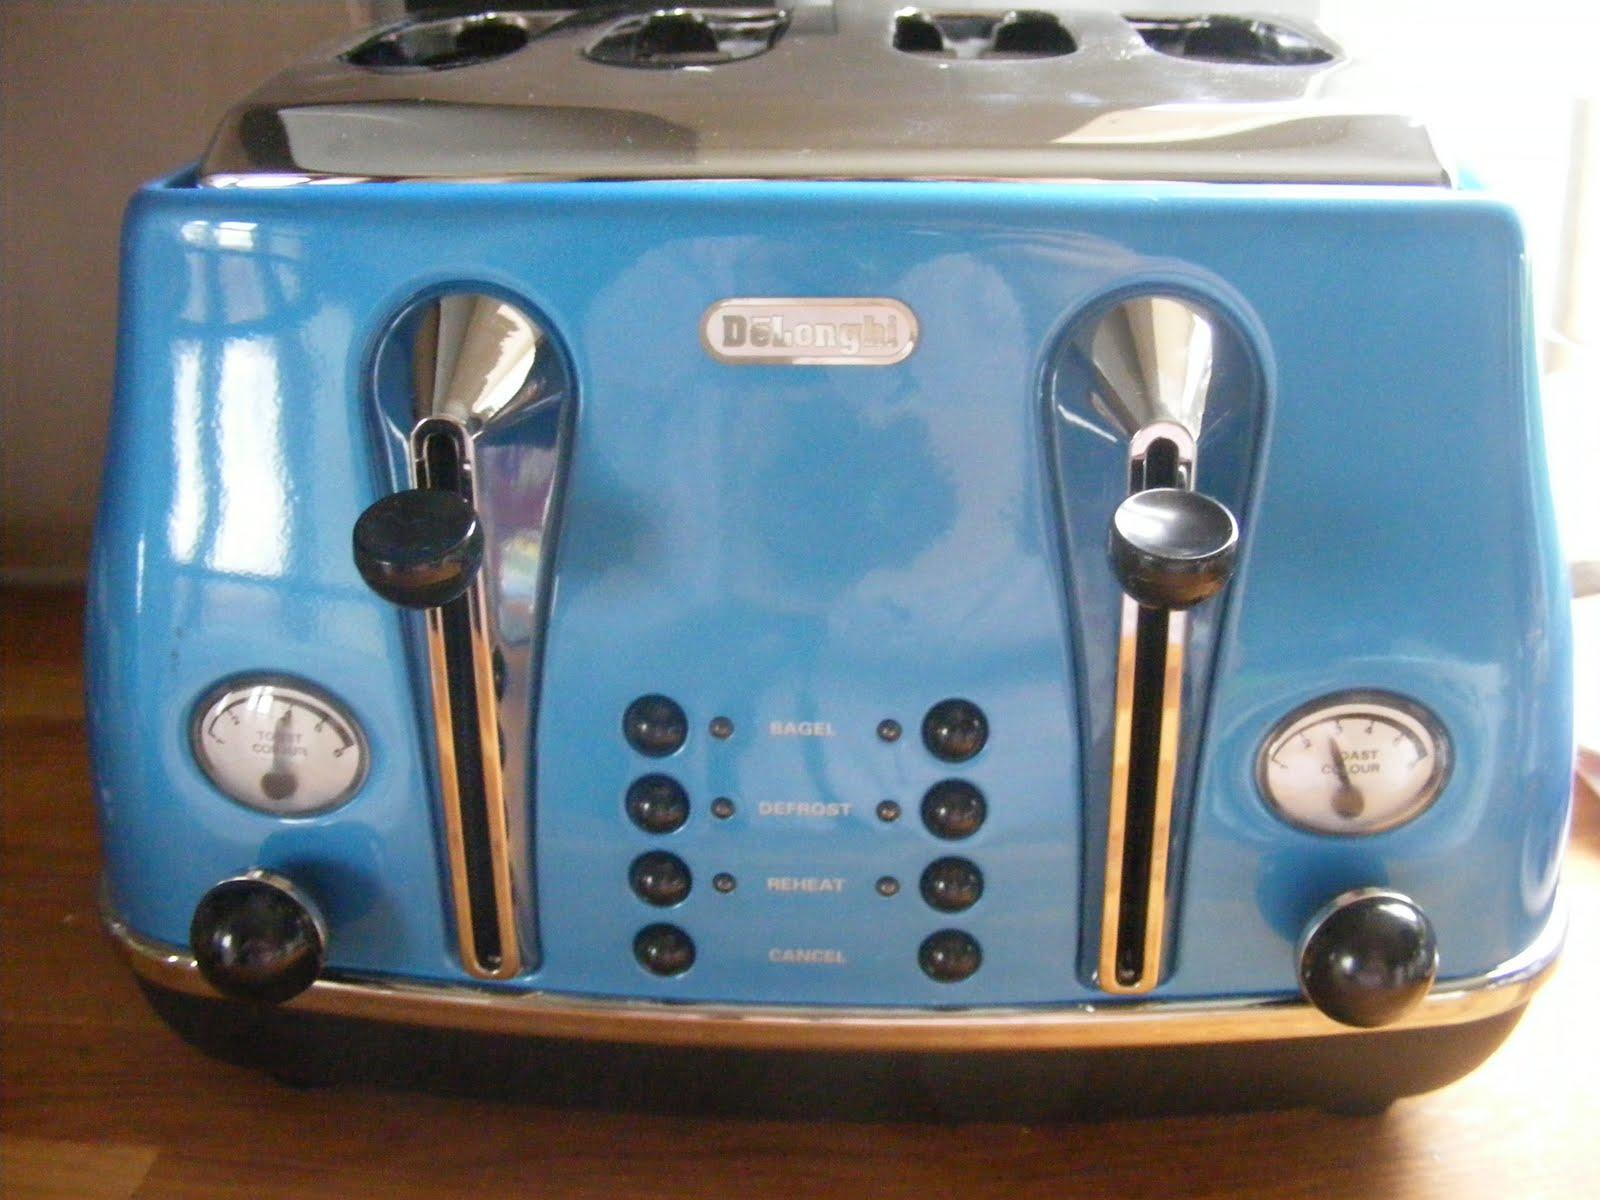 De Longhi Icona toaster review Preston Precious